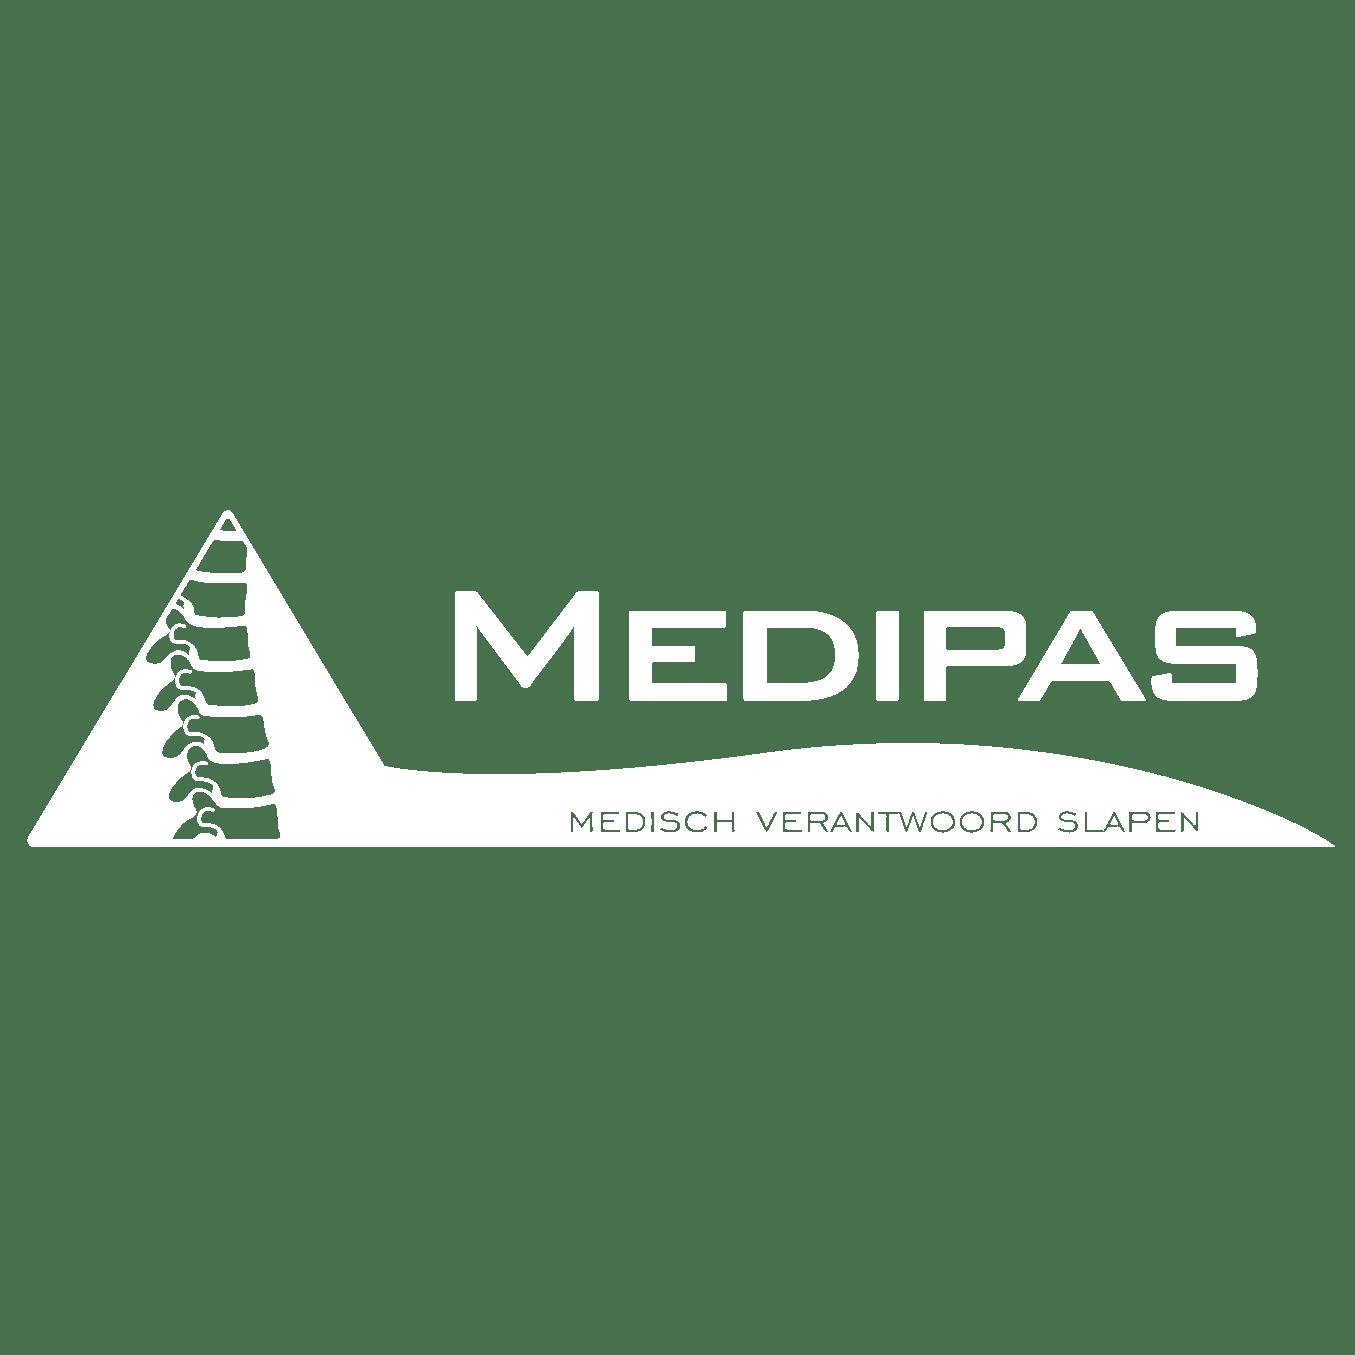 Podotherapie Reggestreek mediapas